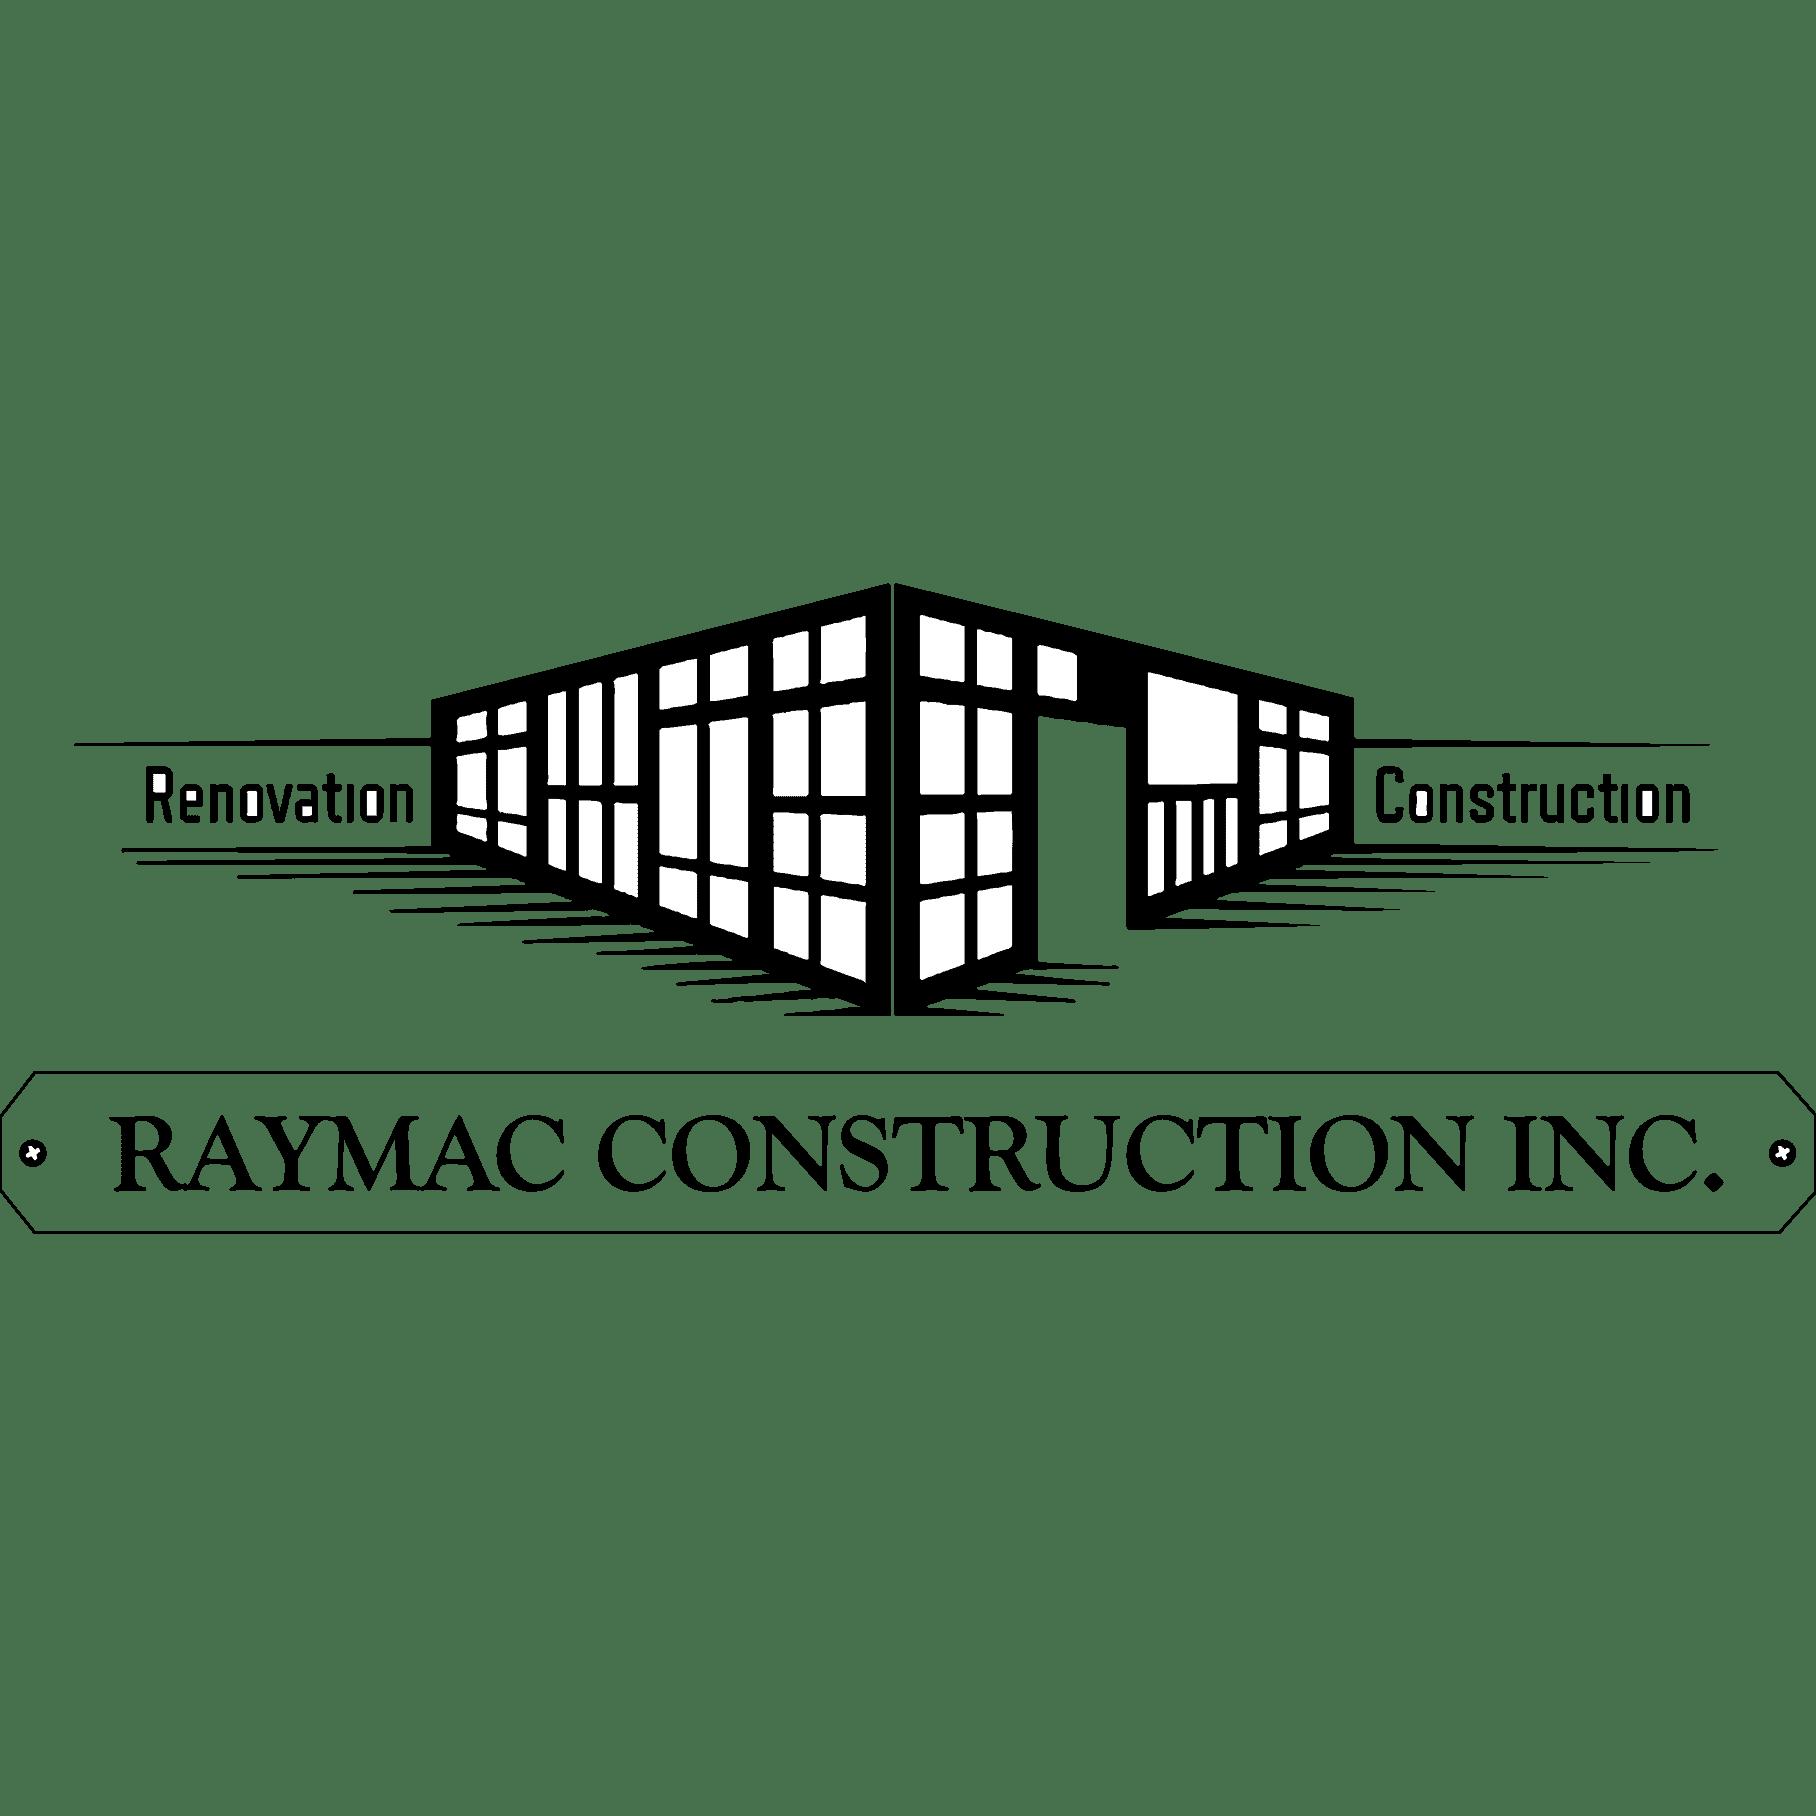 raymac-logo